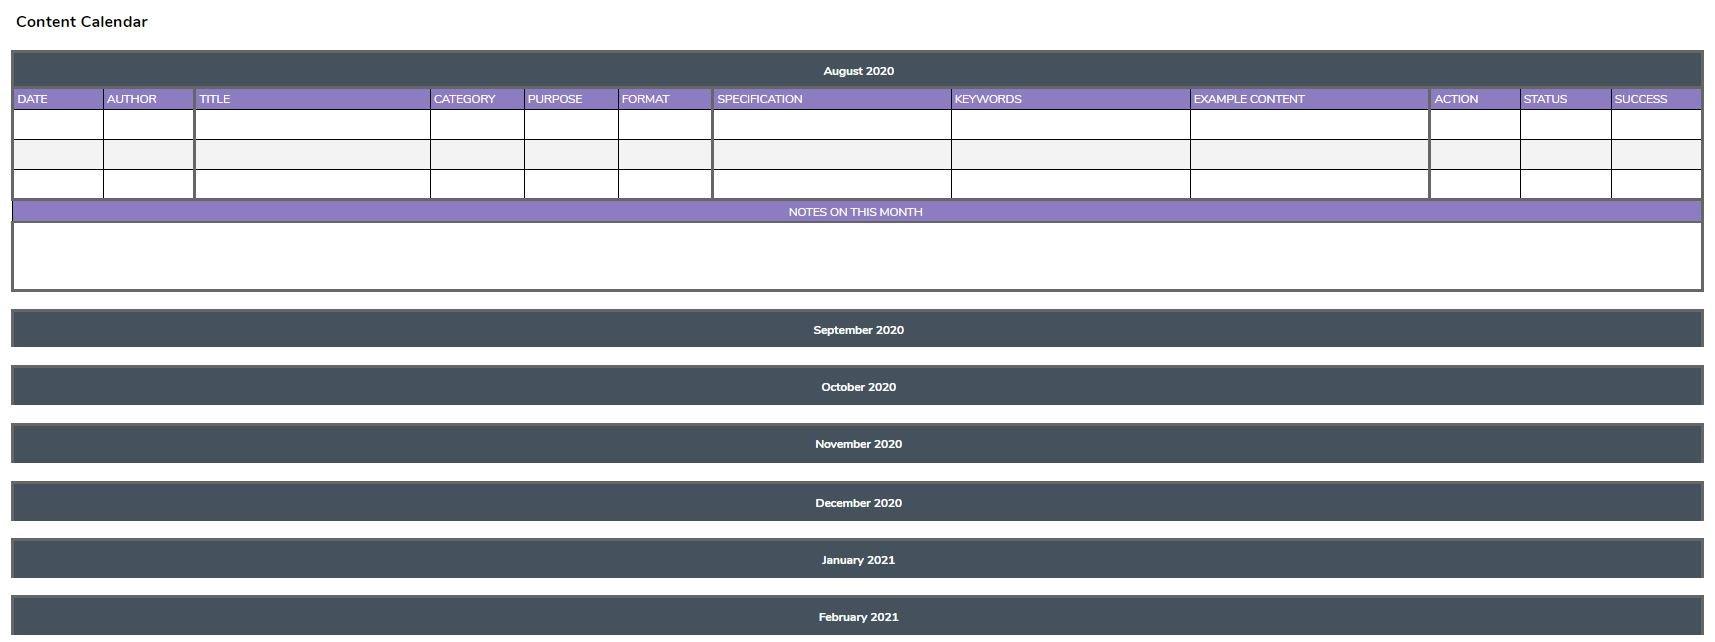 Content Calendar - Macro Digital Strategy Planner